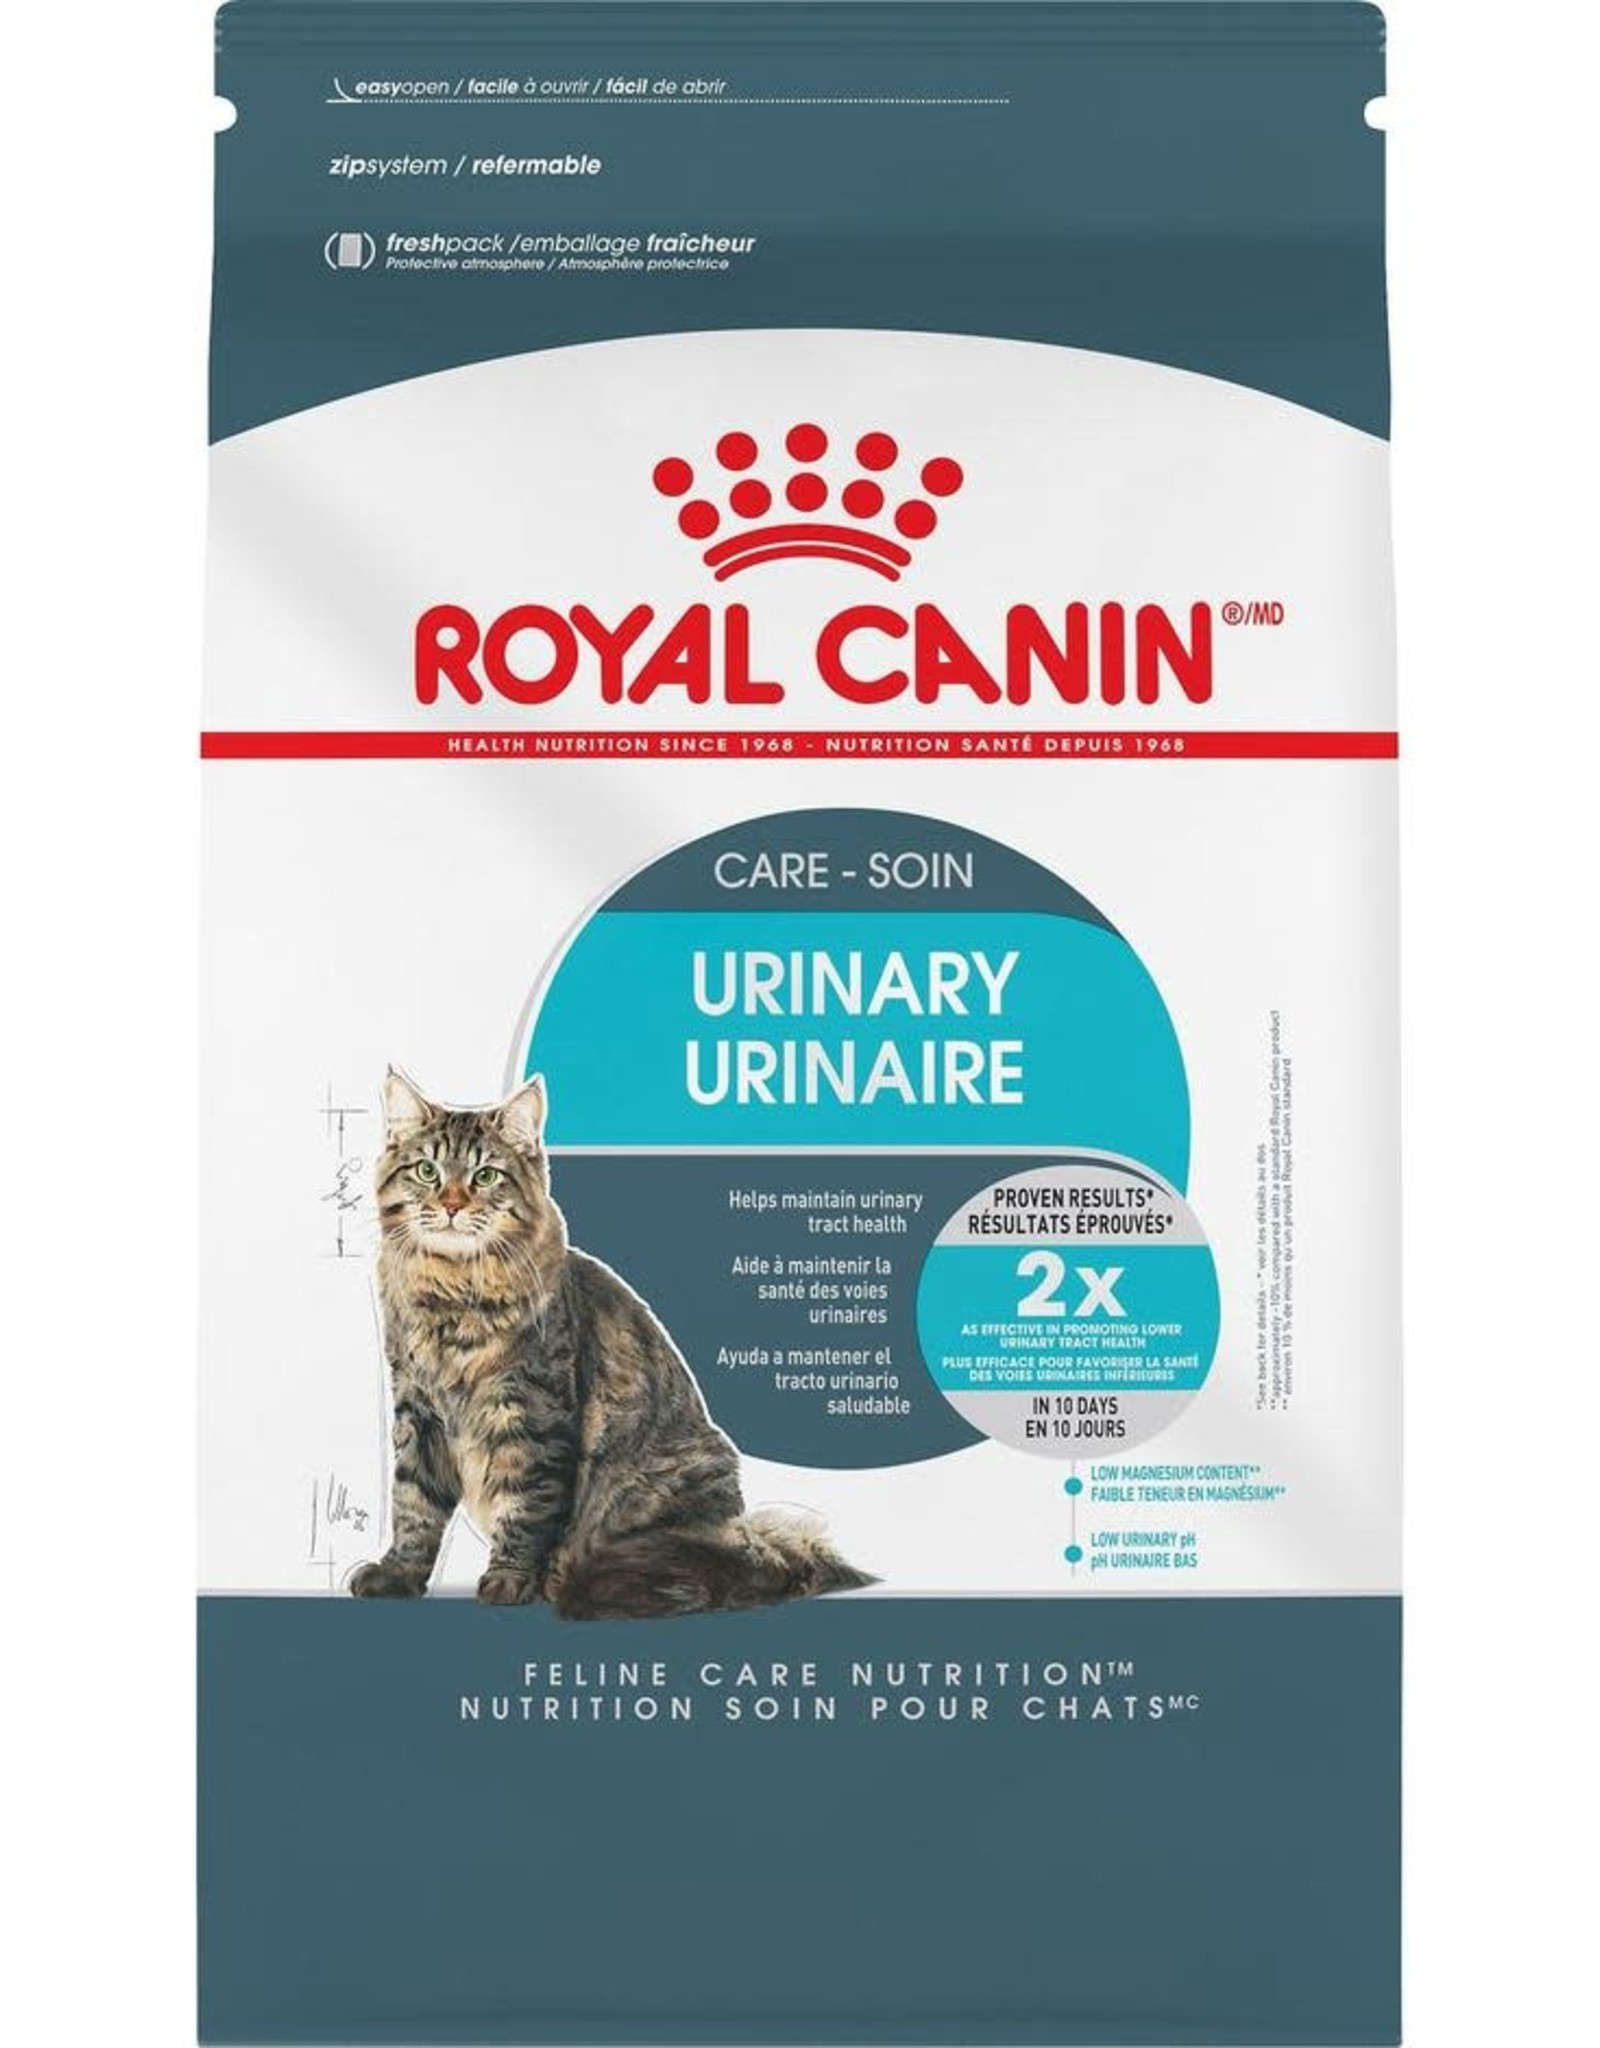 Royal Canin Royal Canin Cat Urinary Care 7lb